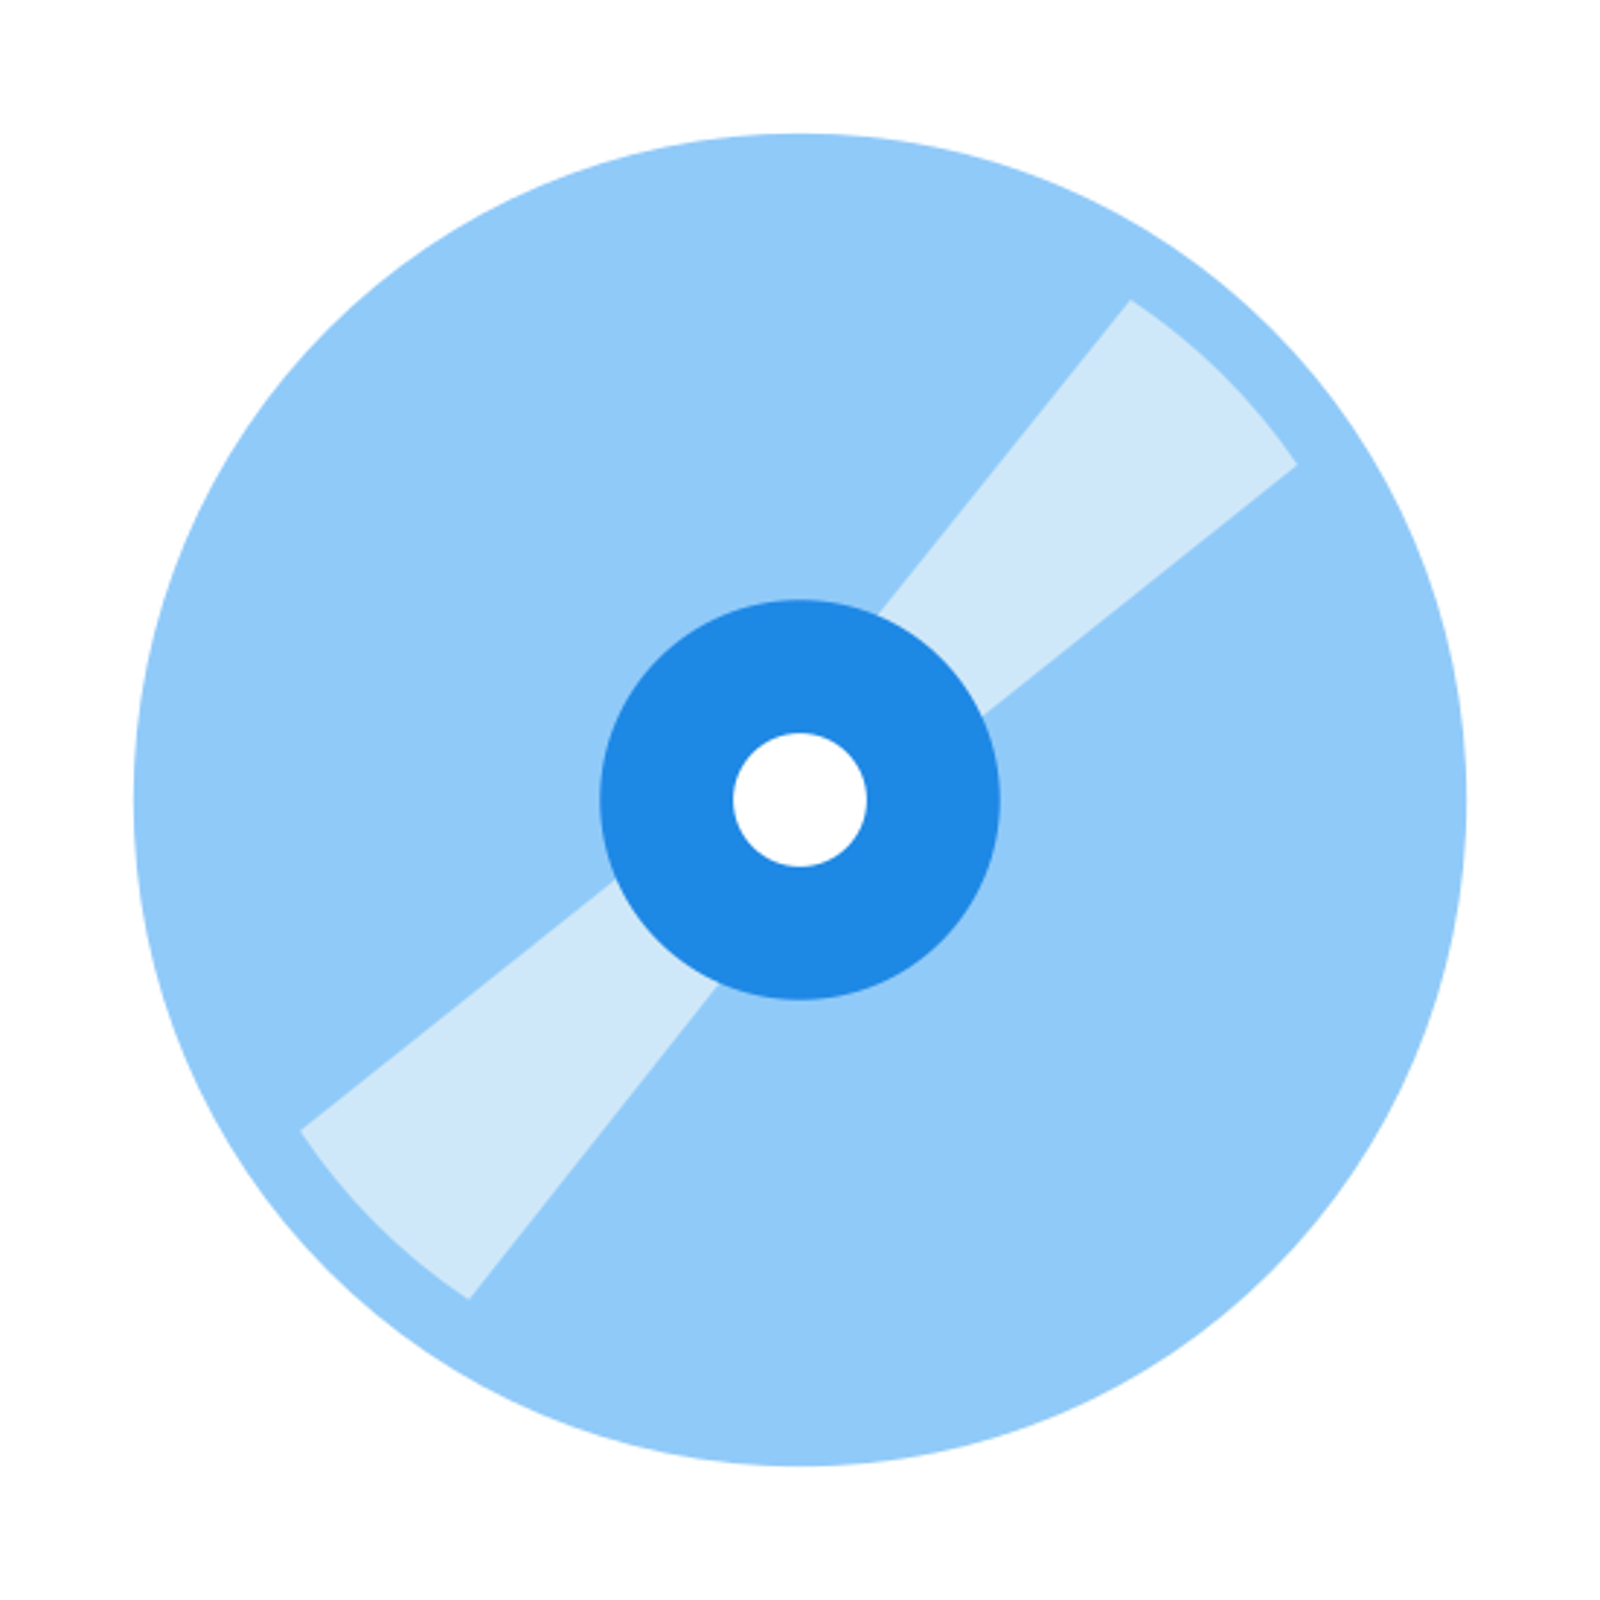 Płyta CD icon